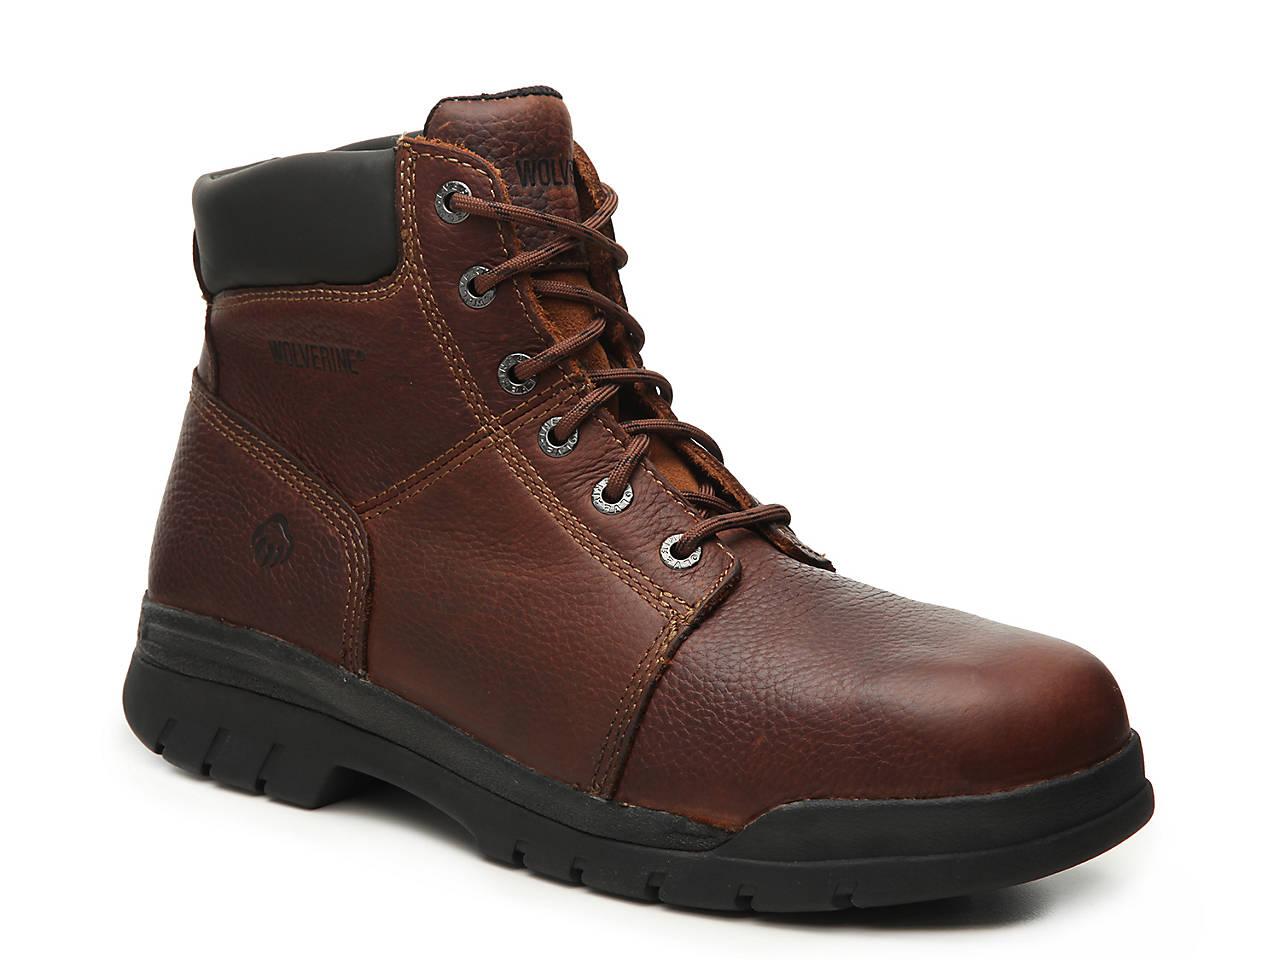 83d7db269b6 Marquette Work Boot